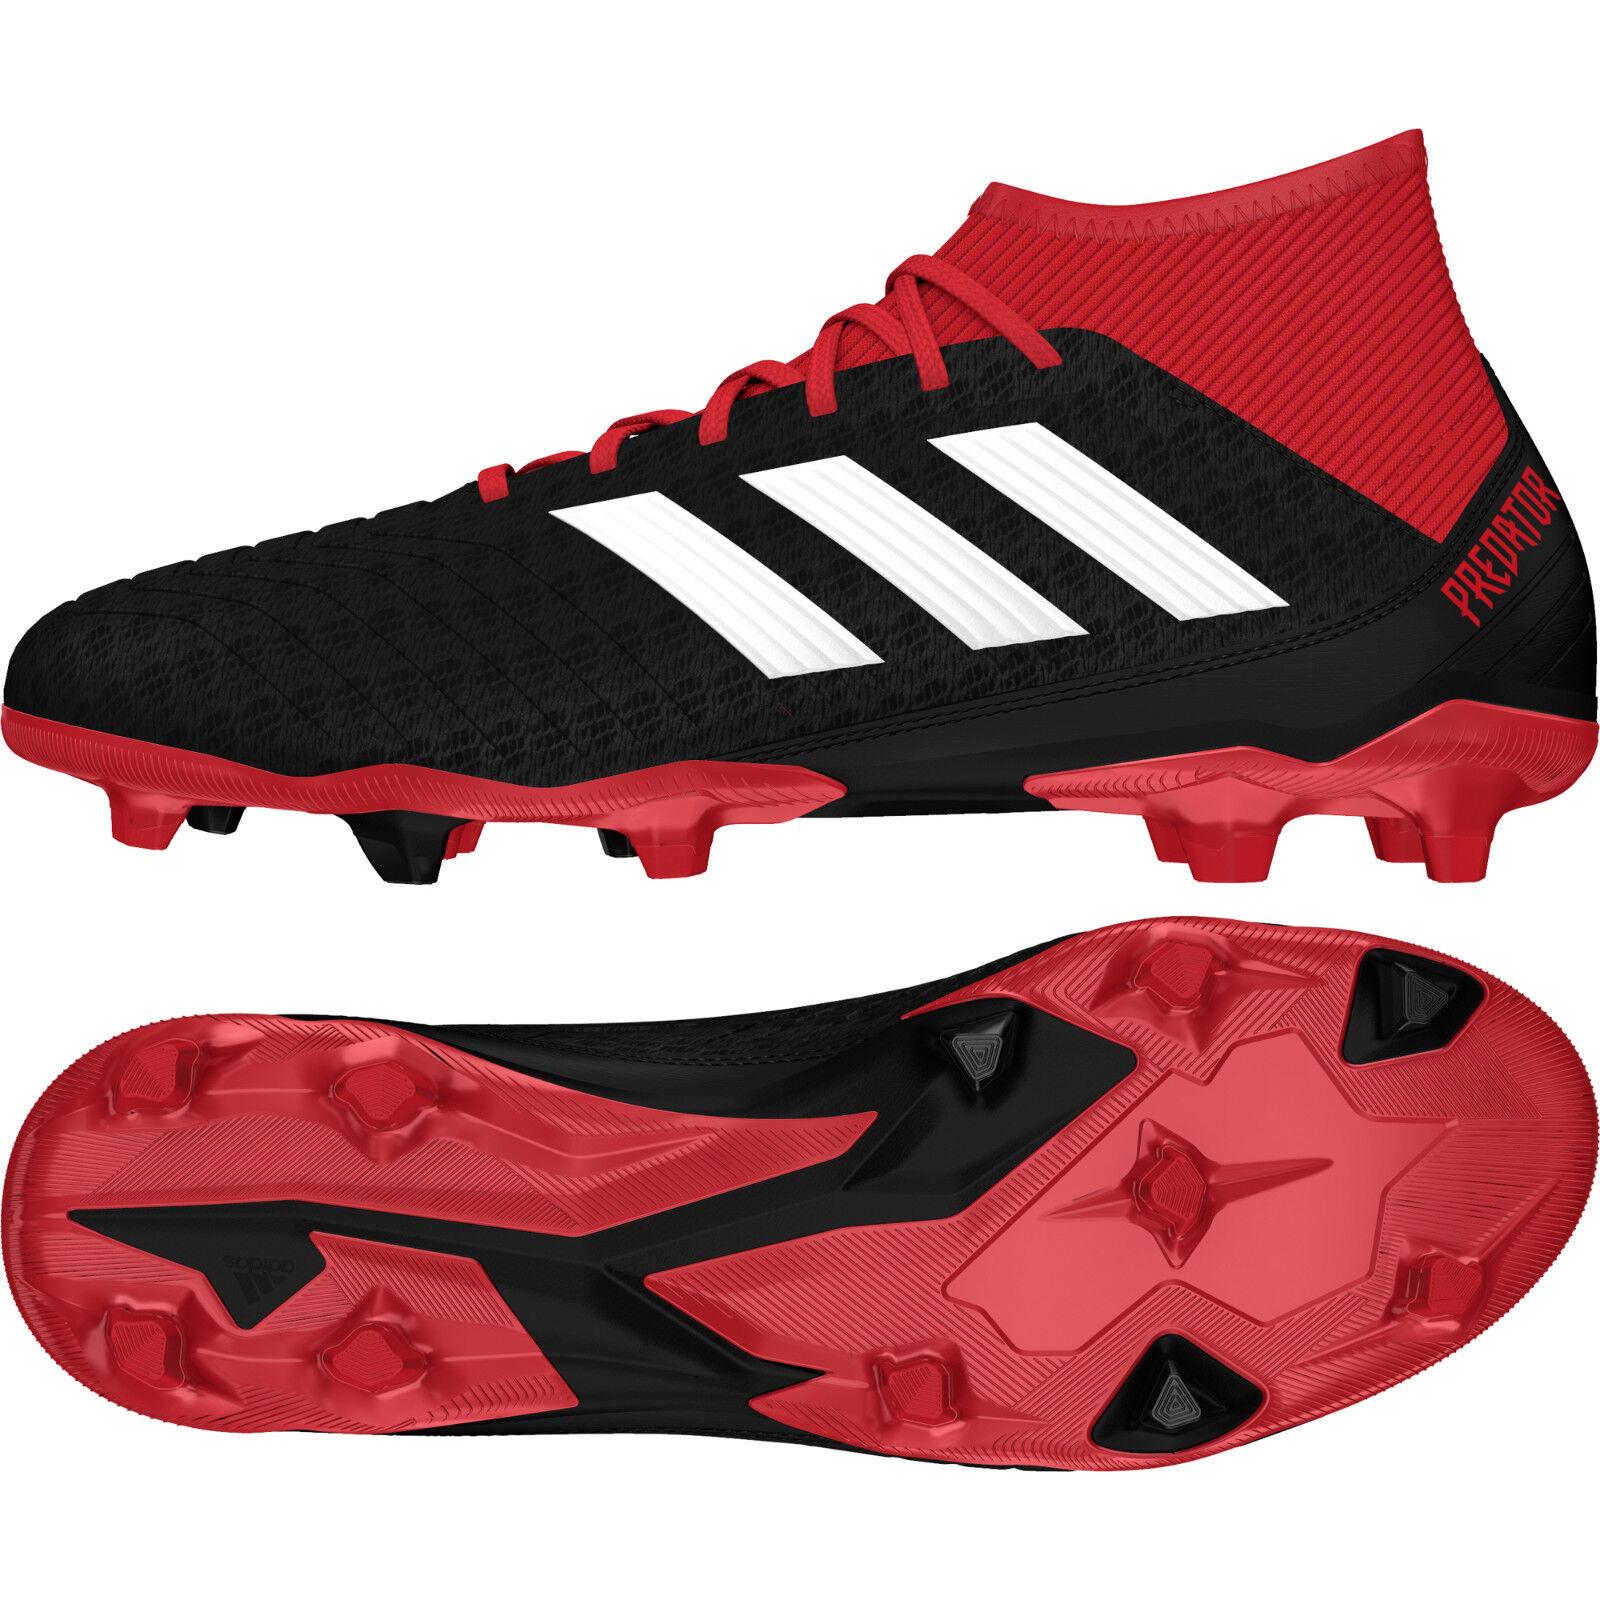 Adidas Kinder Fussballschuhe Protator 18.3 FG Nockenschuhe Sockenschuhe DB2318